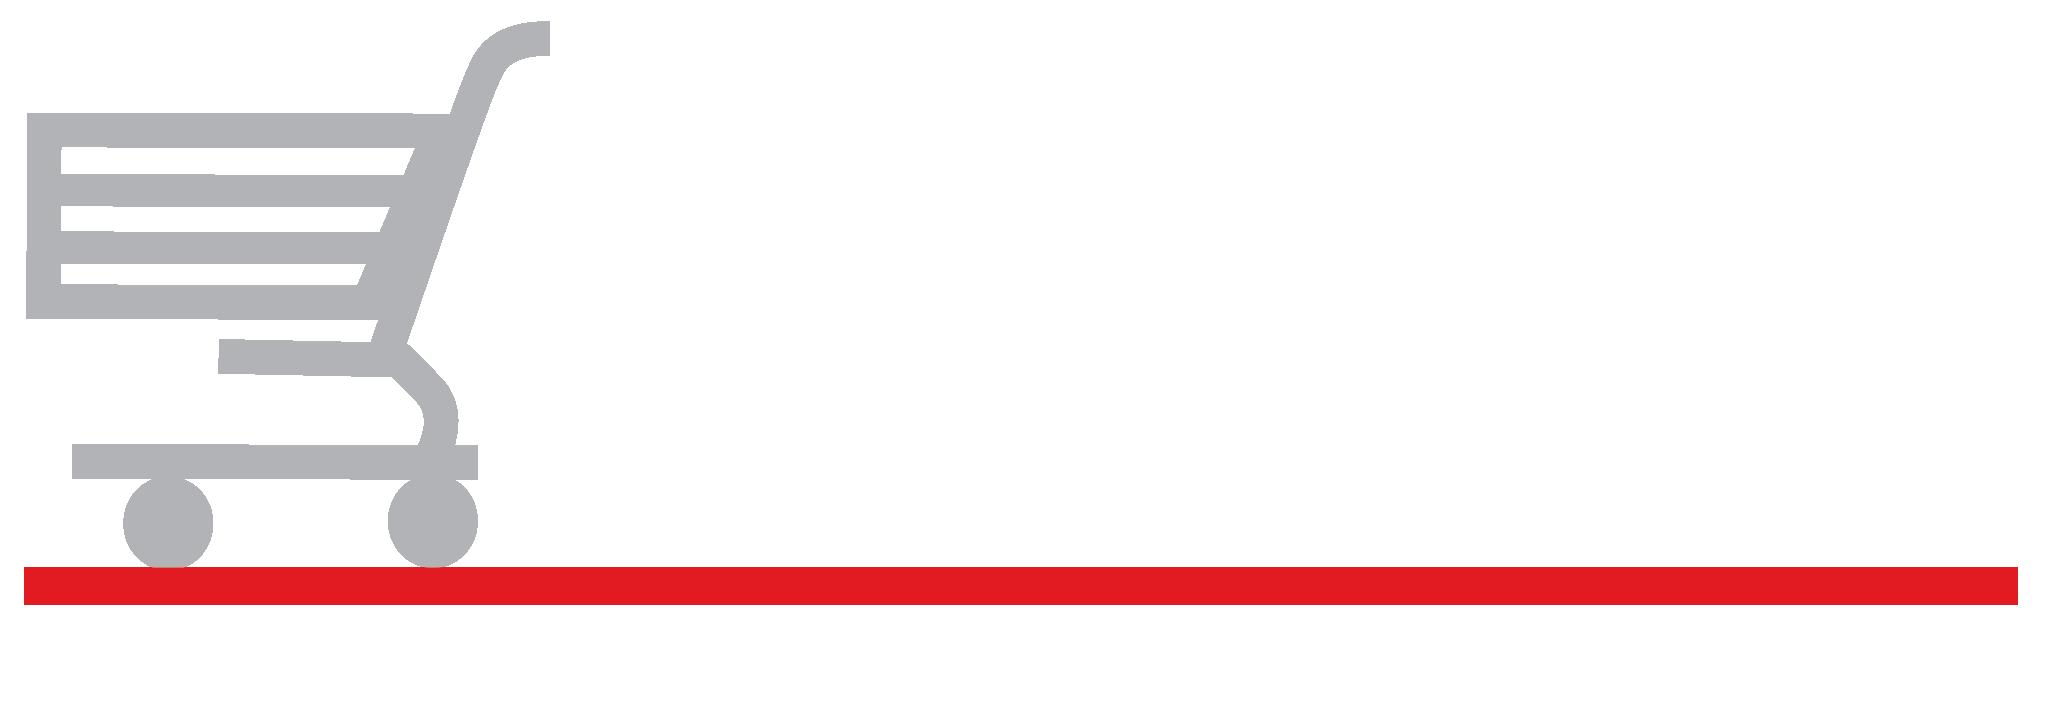 OSMG_Cincinnati Logo White-01.png